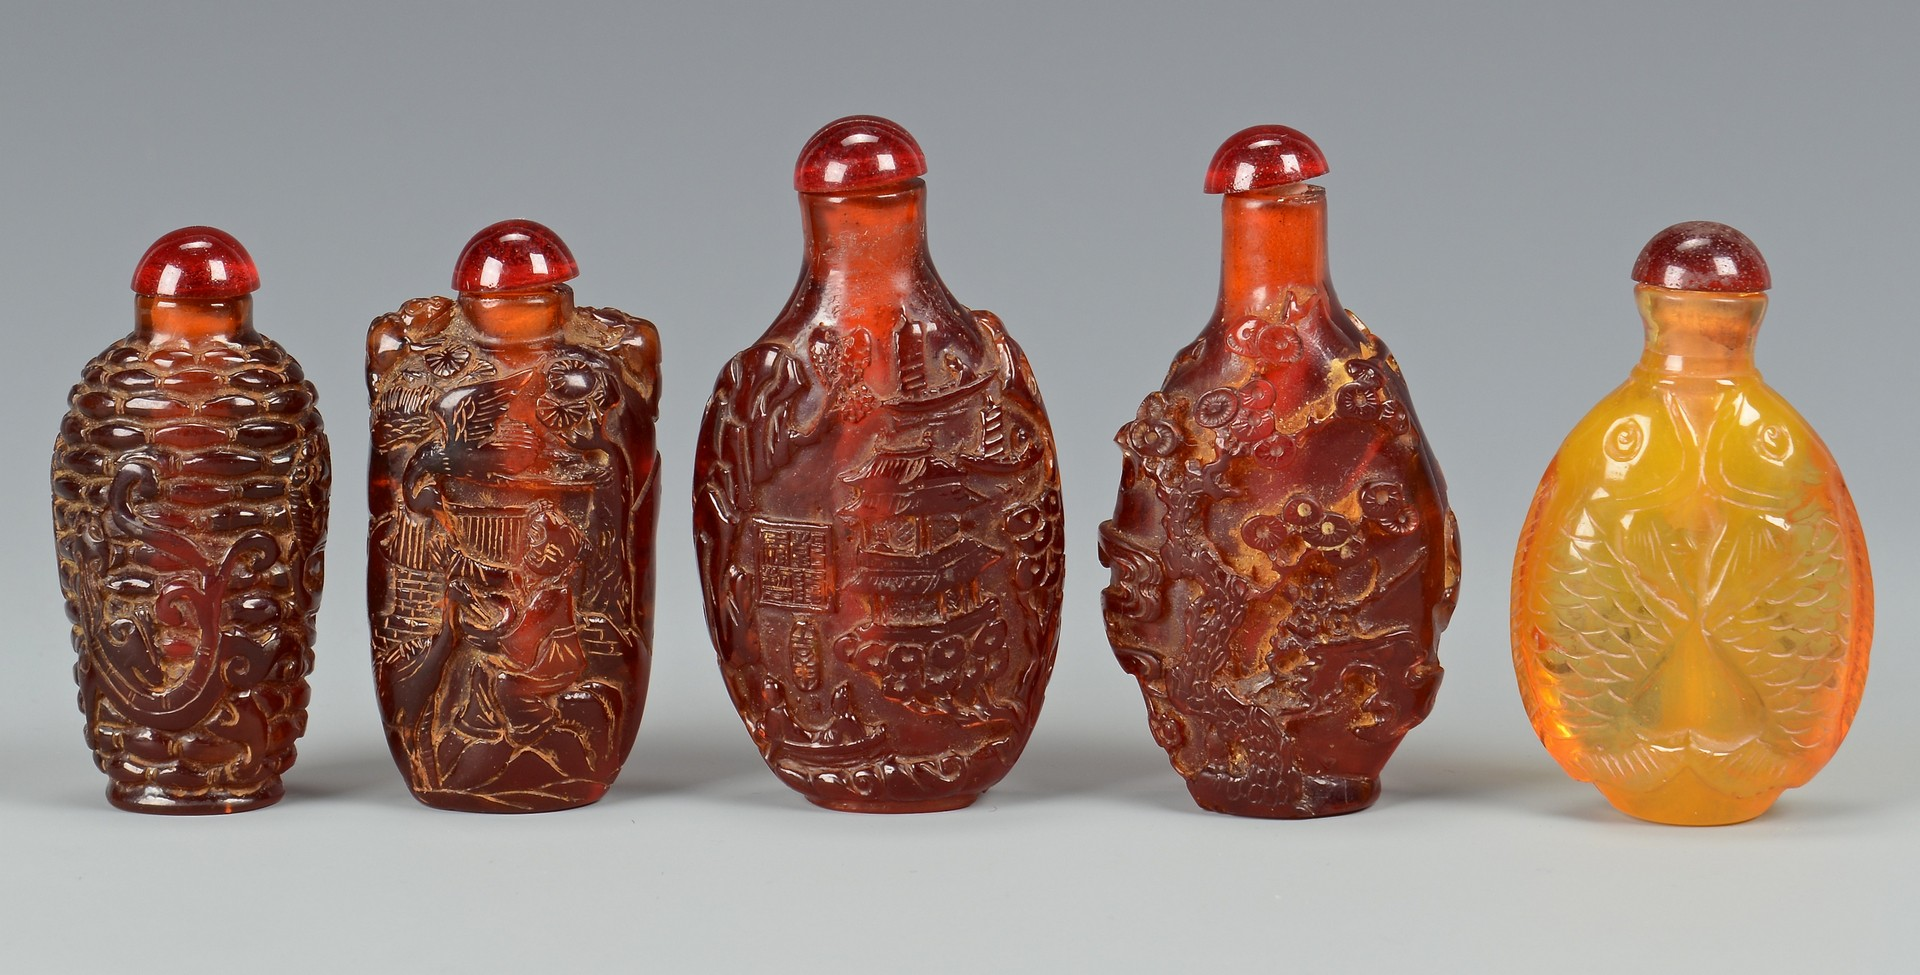 Lot 784: Group of Asian Decorative Items, 12 pcs.